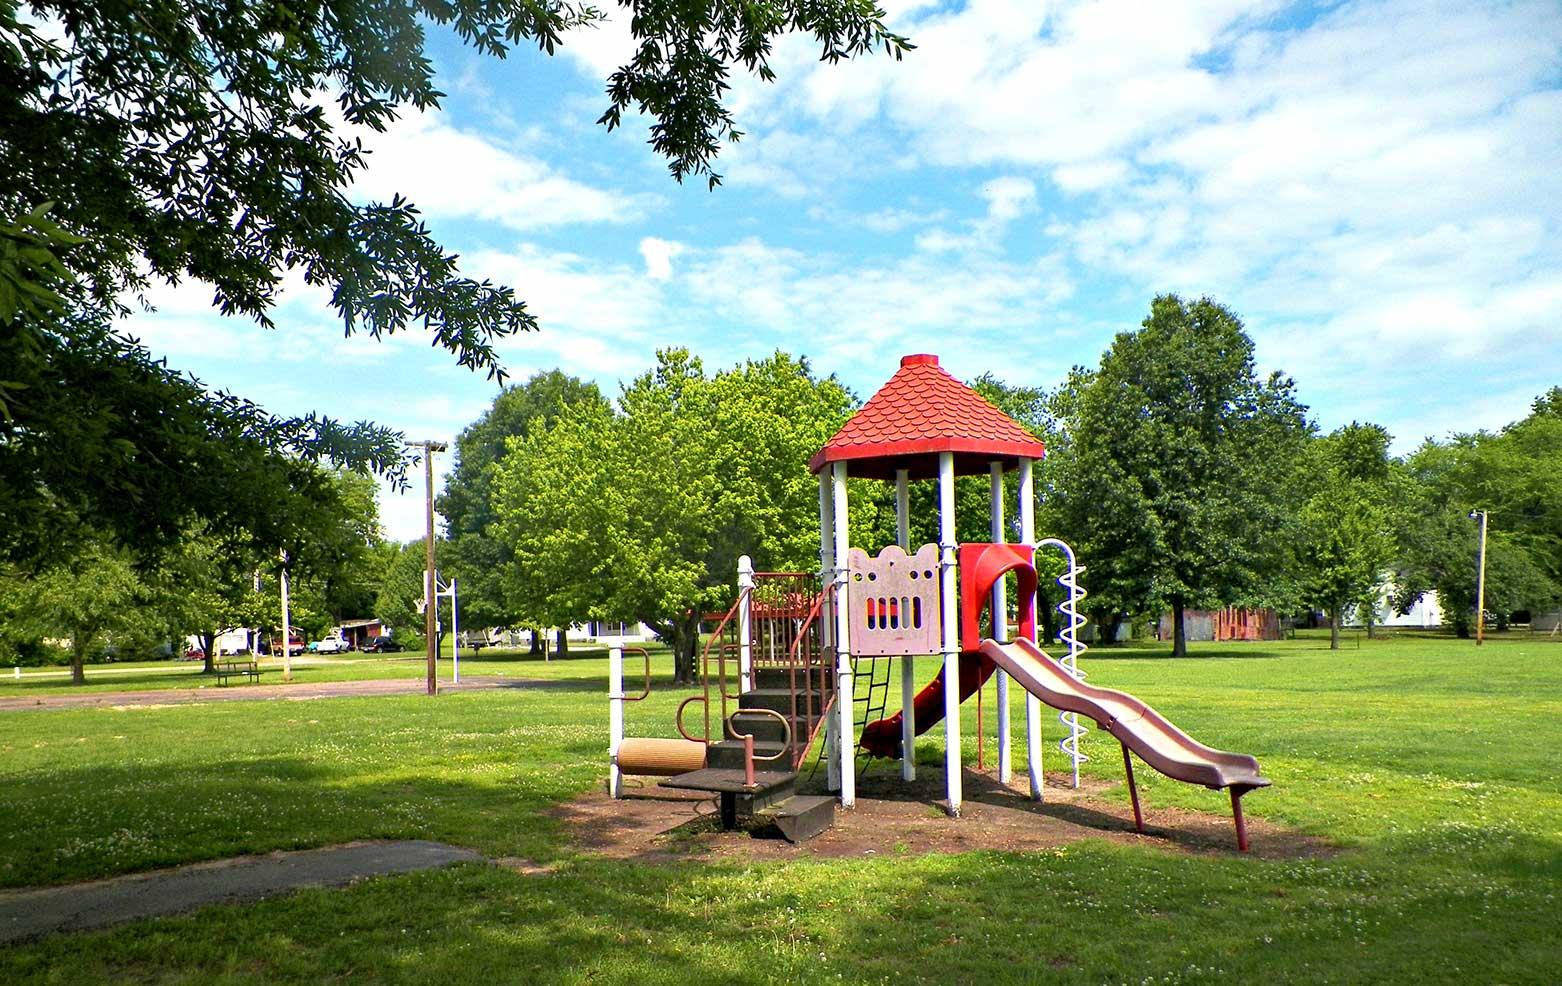 Indian Park - Playground